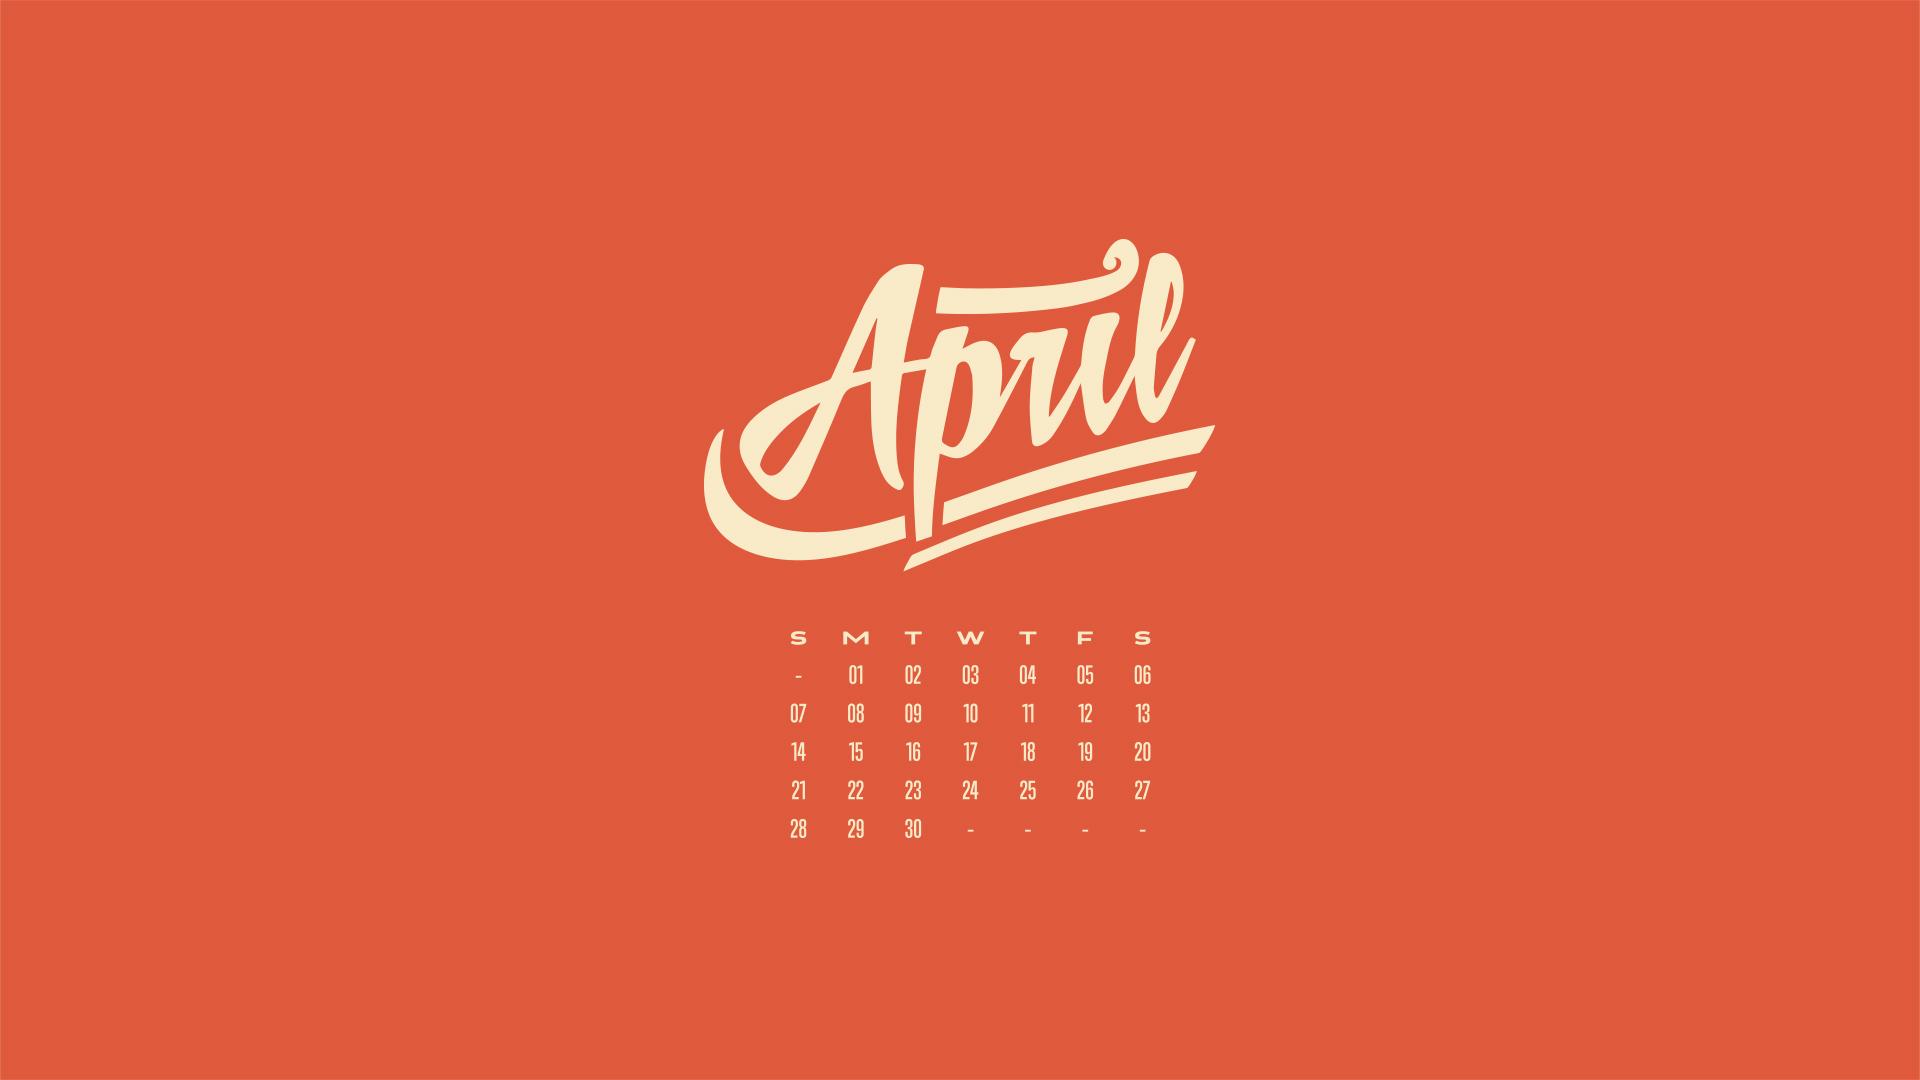 April 2013 Desktop Calendar Wallpaper Paper Leaf Design 1920x1080